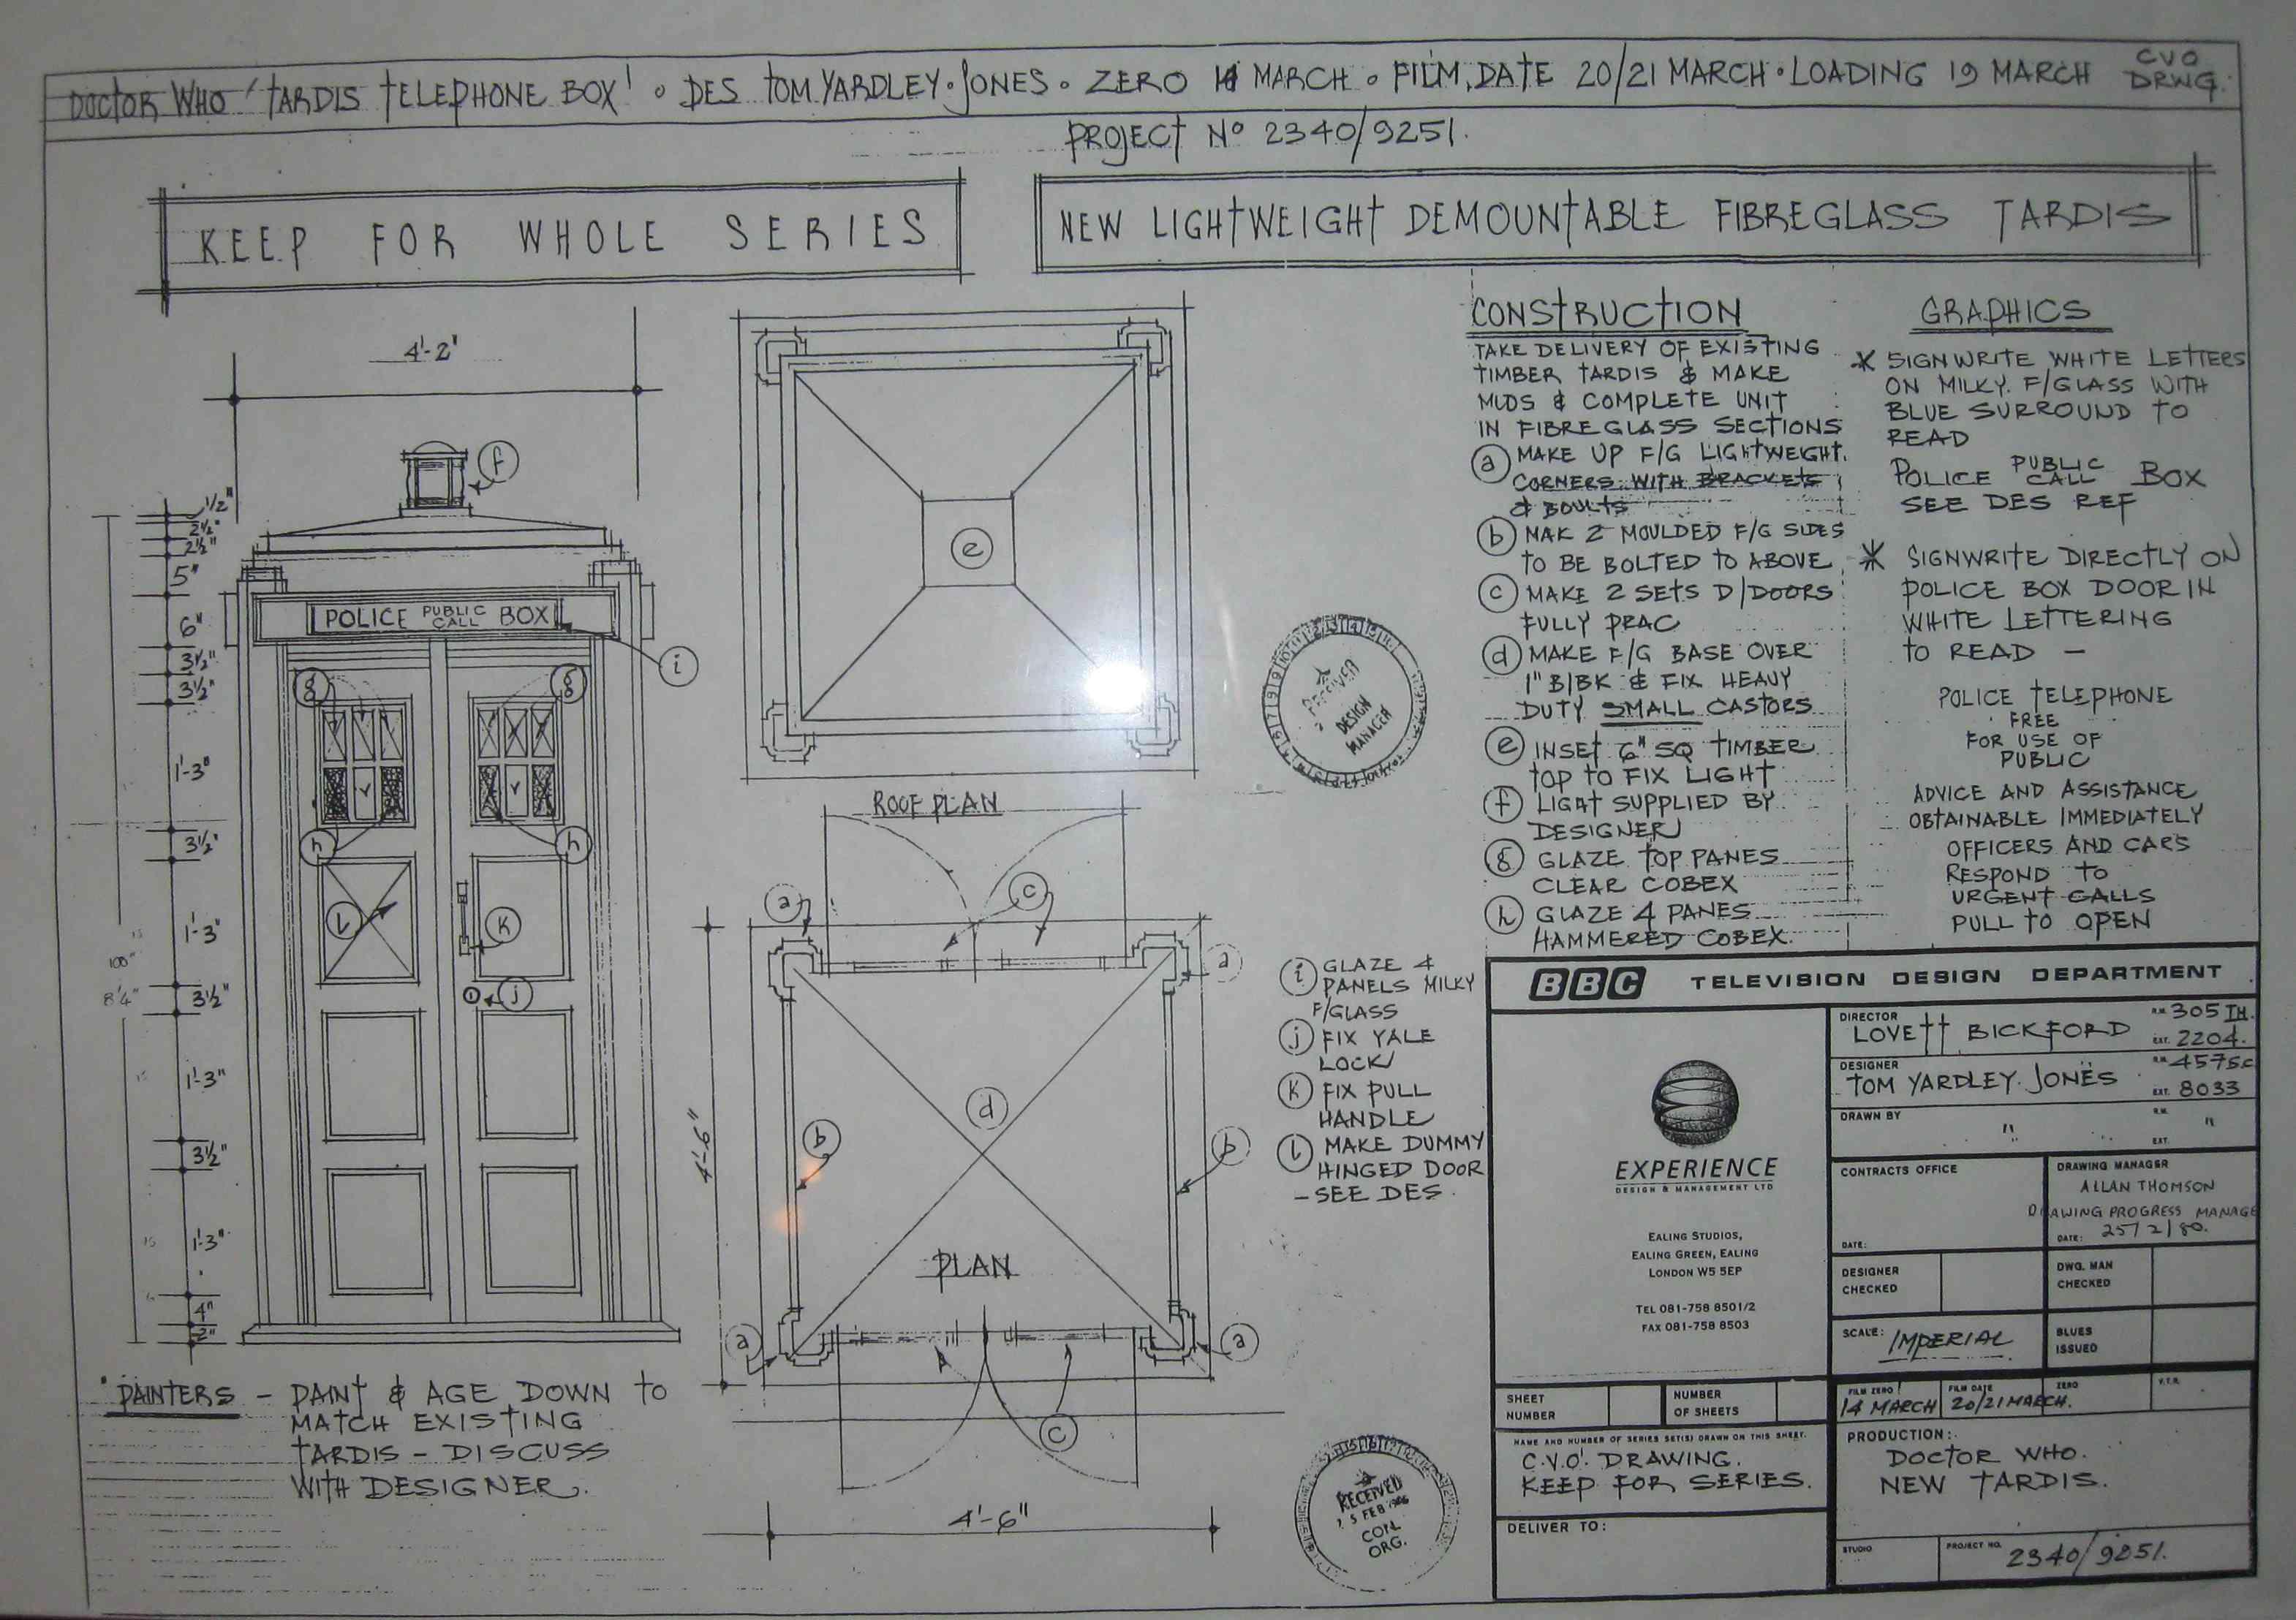 Yardley-Jones_1980_Plans.jpg